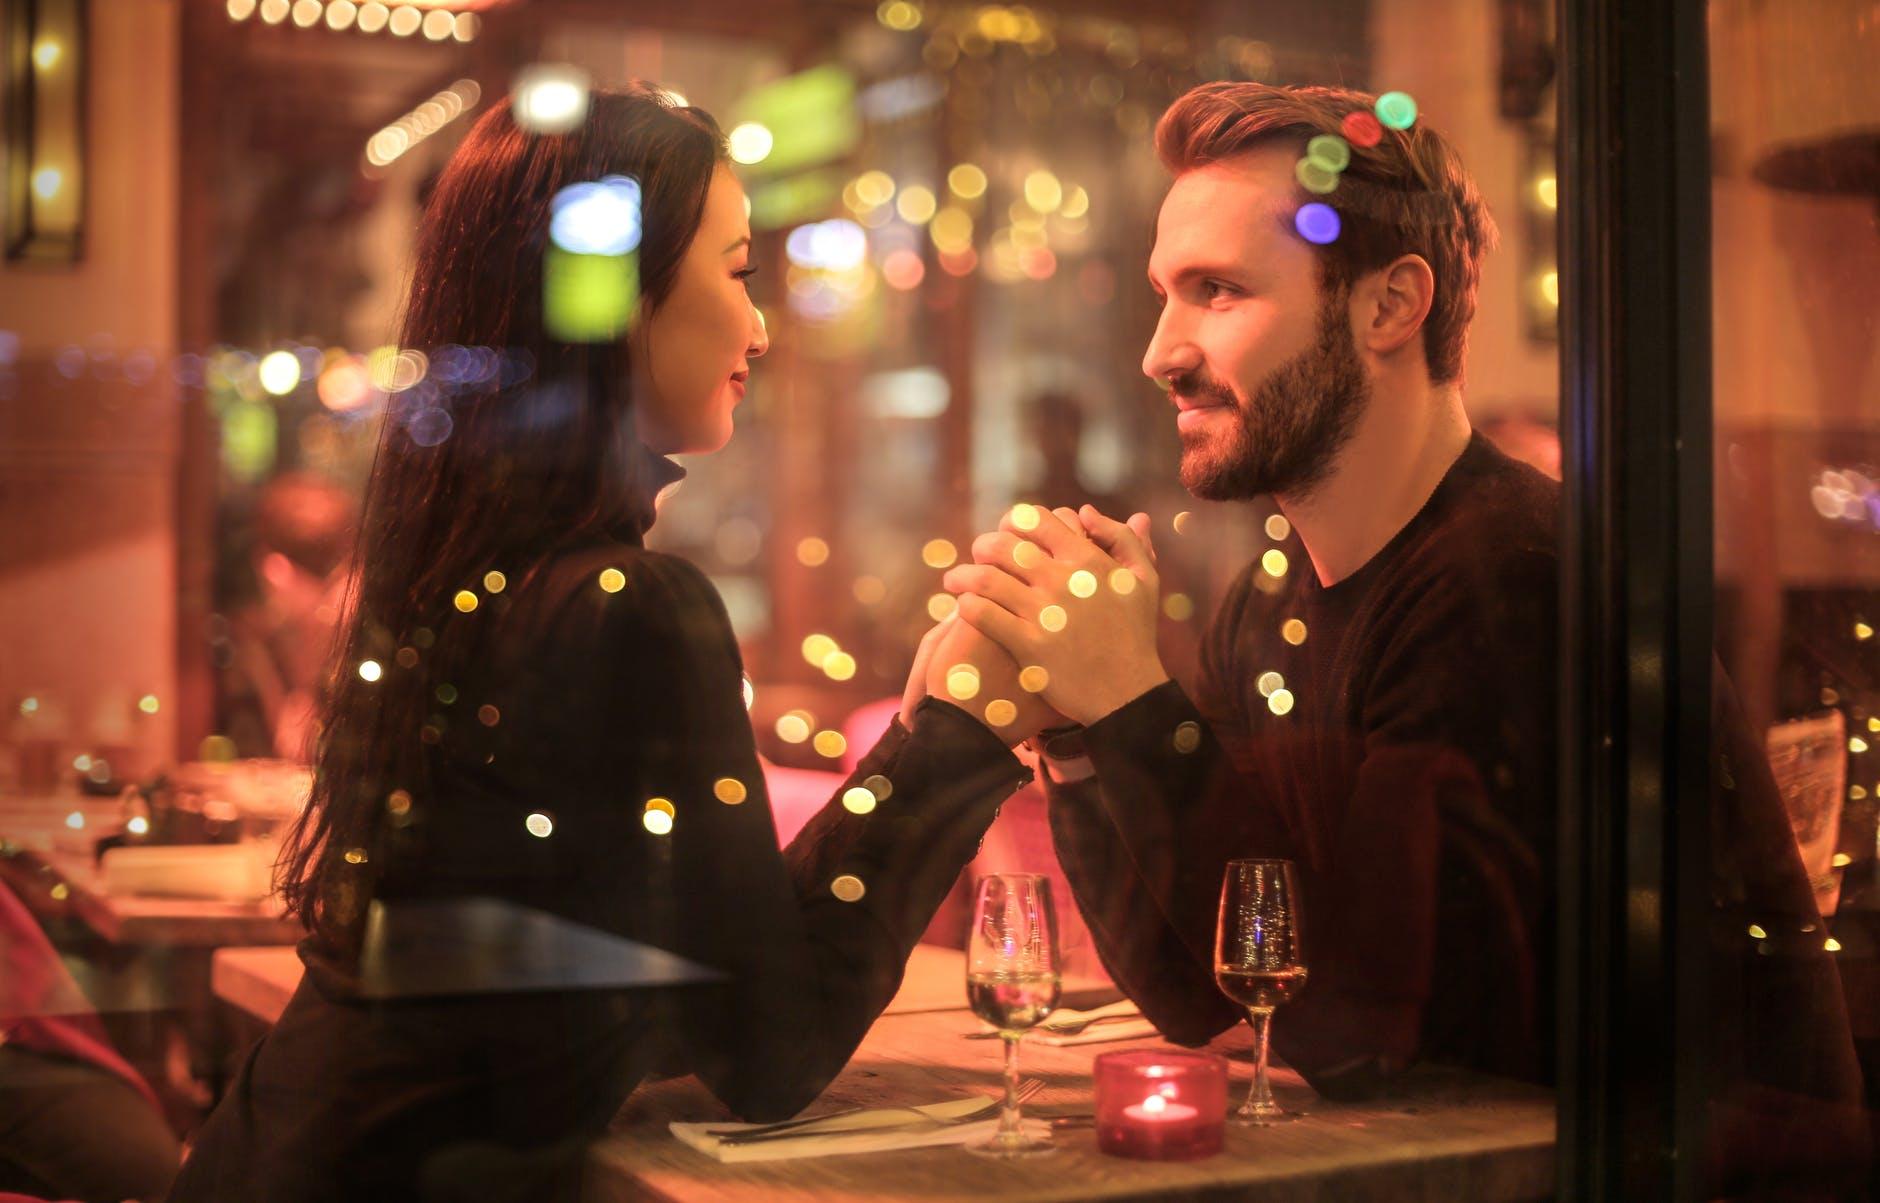 dating เนเธอร์แลนด์ที่ประชุมดัตช์ผู้หญิงและผู้ชายเว็บไซต์หาคู่ออนไลน์